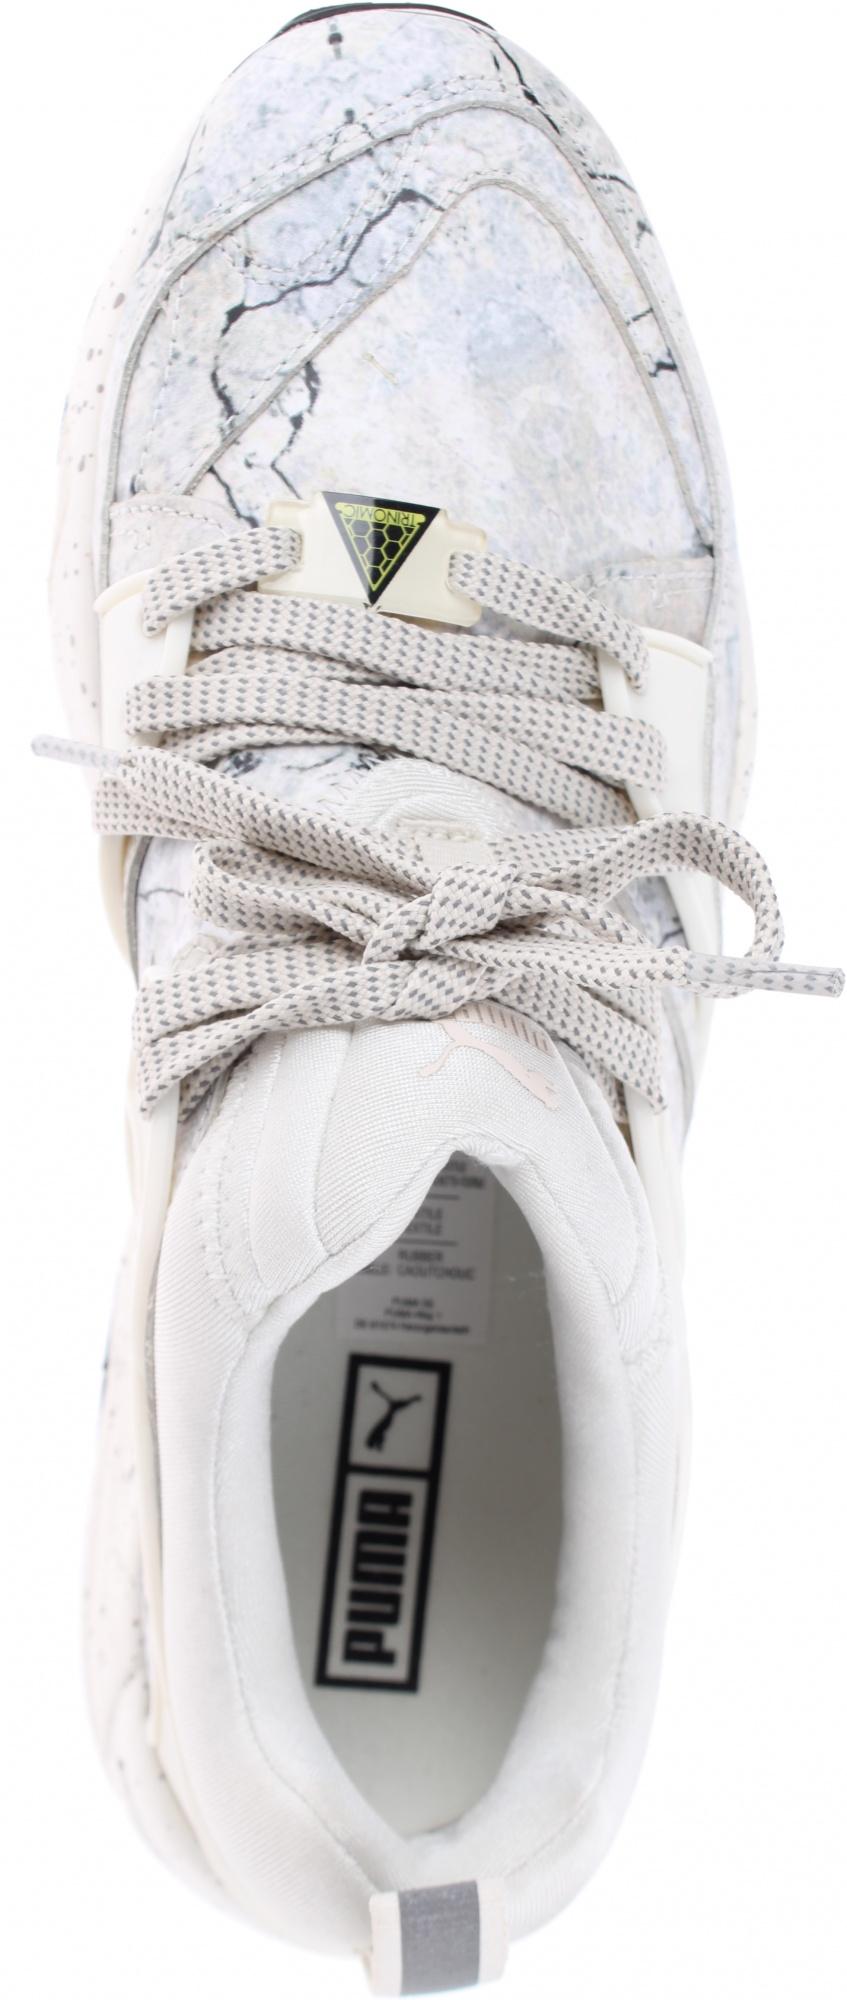 f8c6253c1fe Sport Wit amp;casuals Of Blaze Internet Puma Glory Heren Roxx Sneakers  q8CB6wUgR